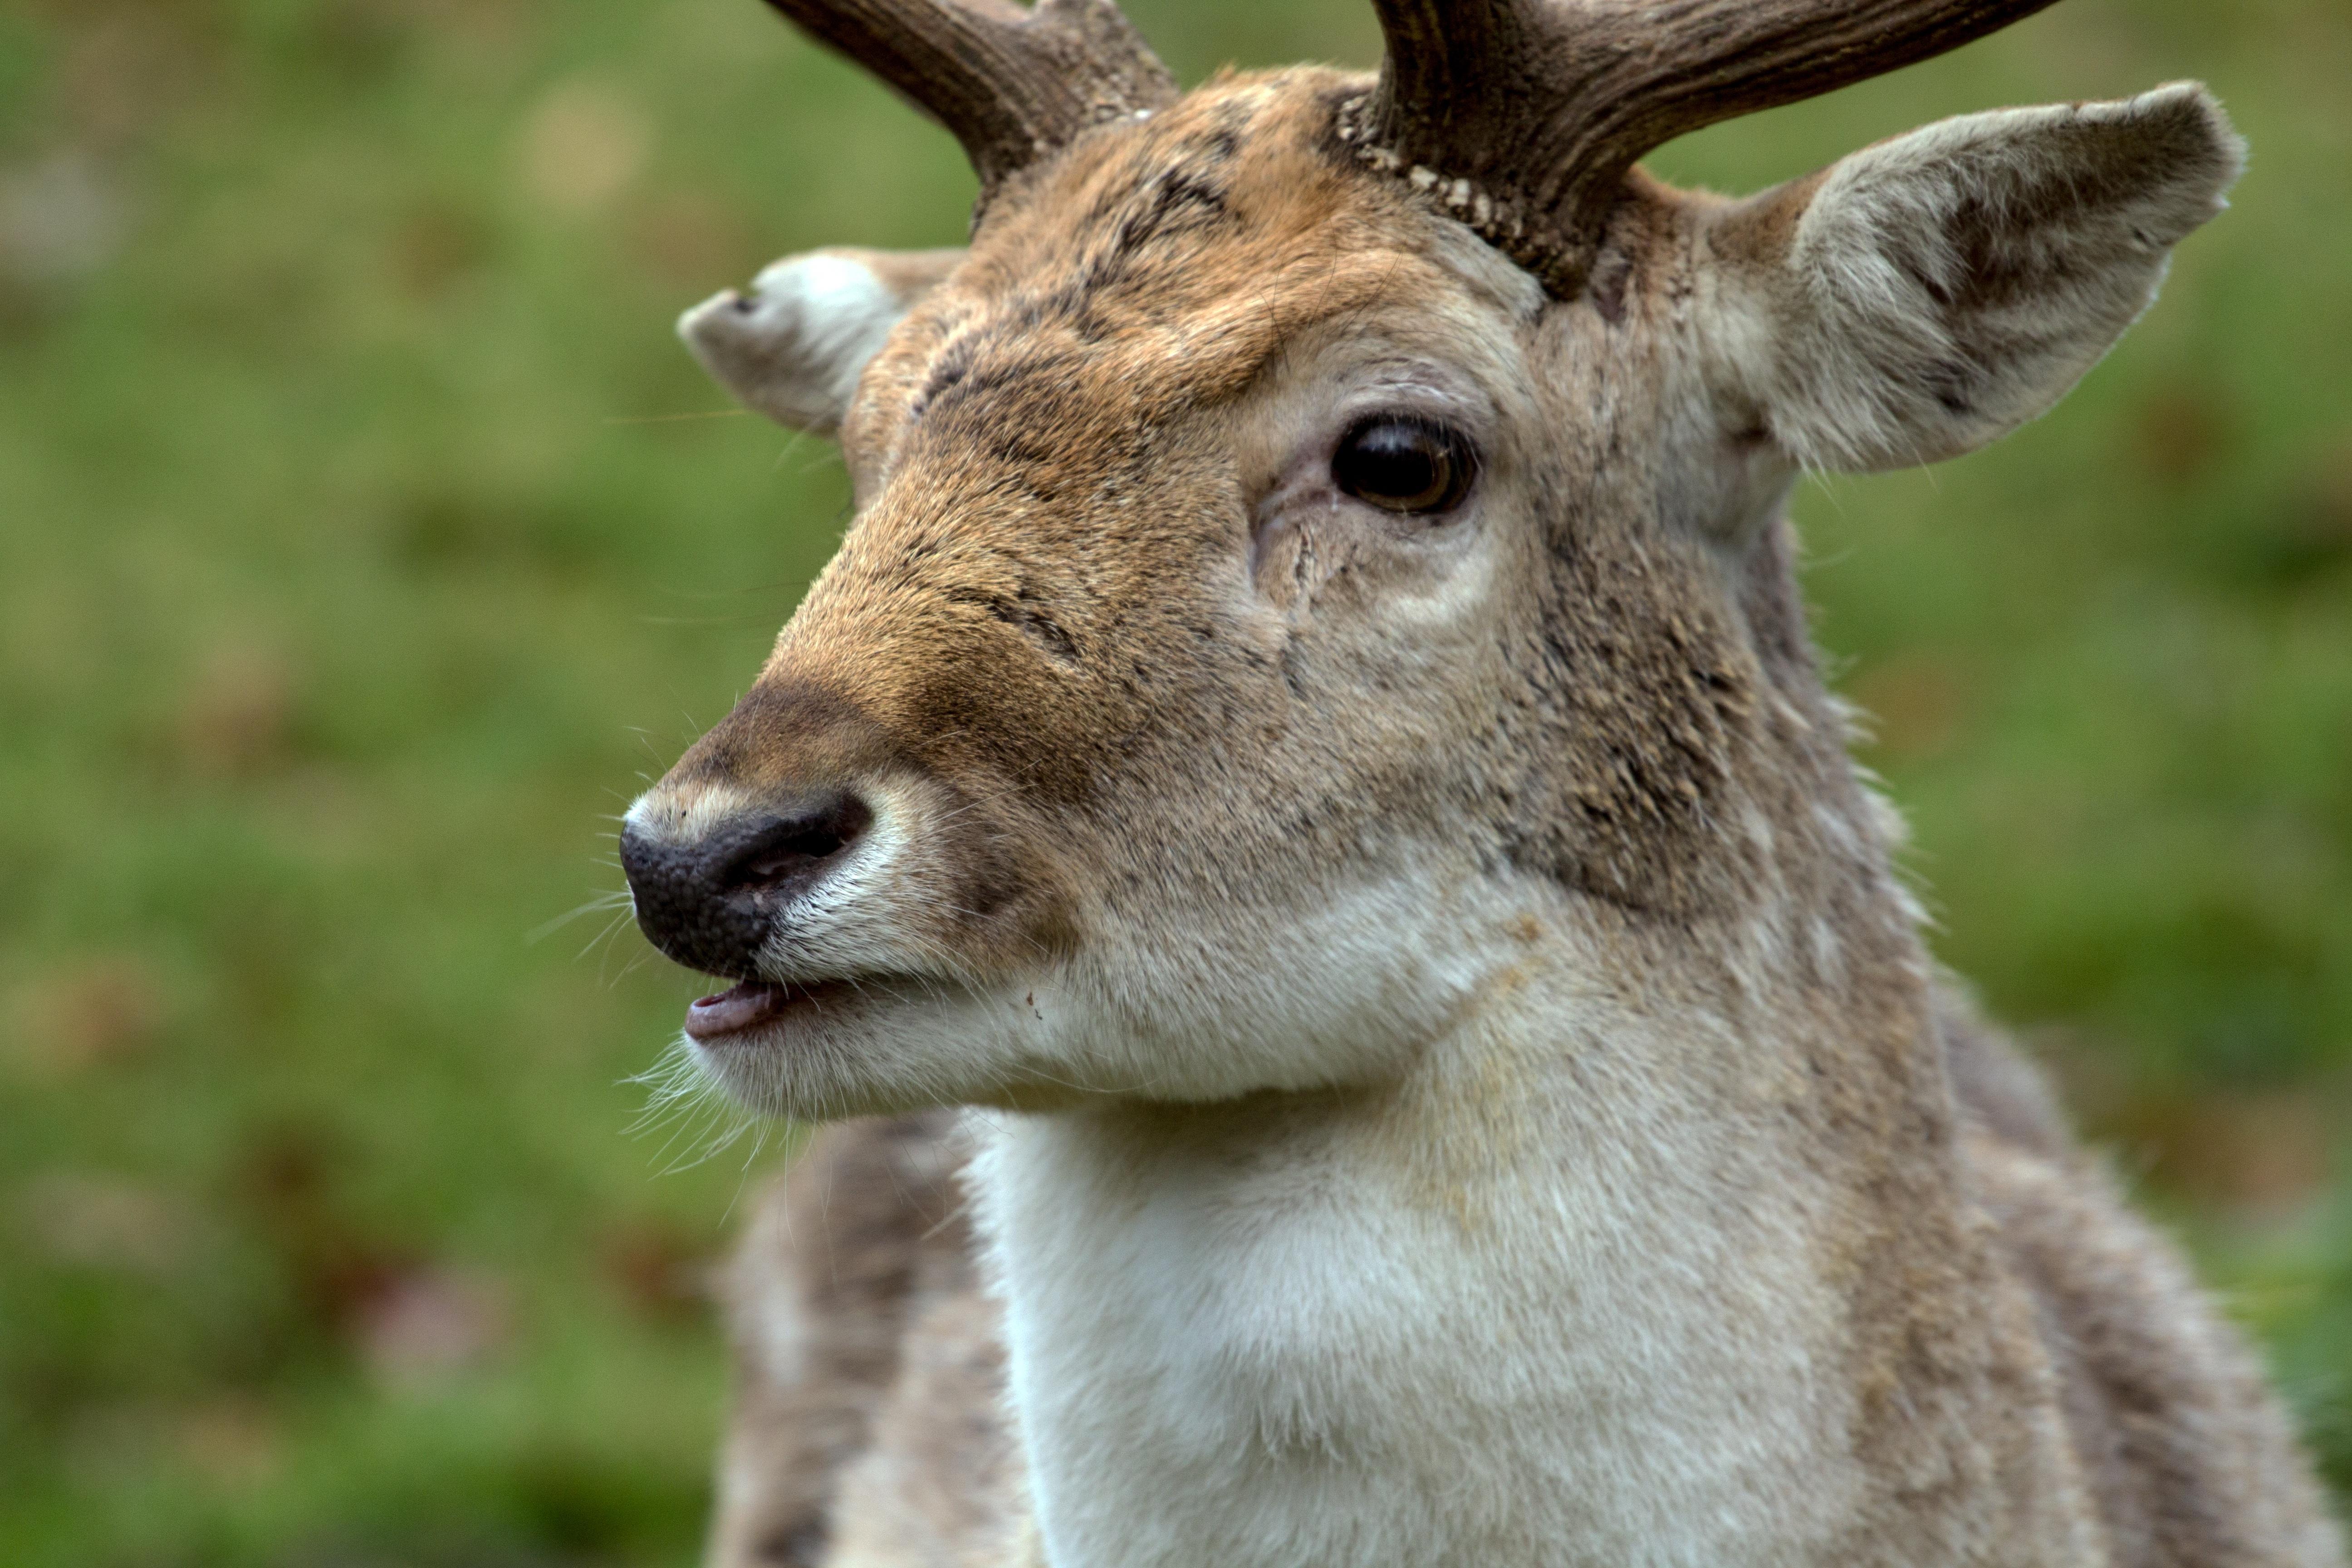 5800 Gambar Binatang Bertulang Belakang Gratis